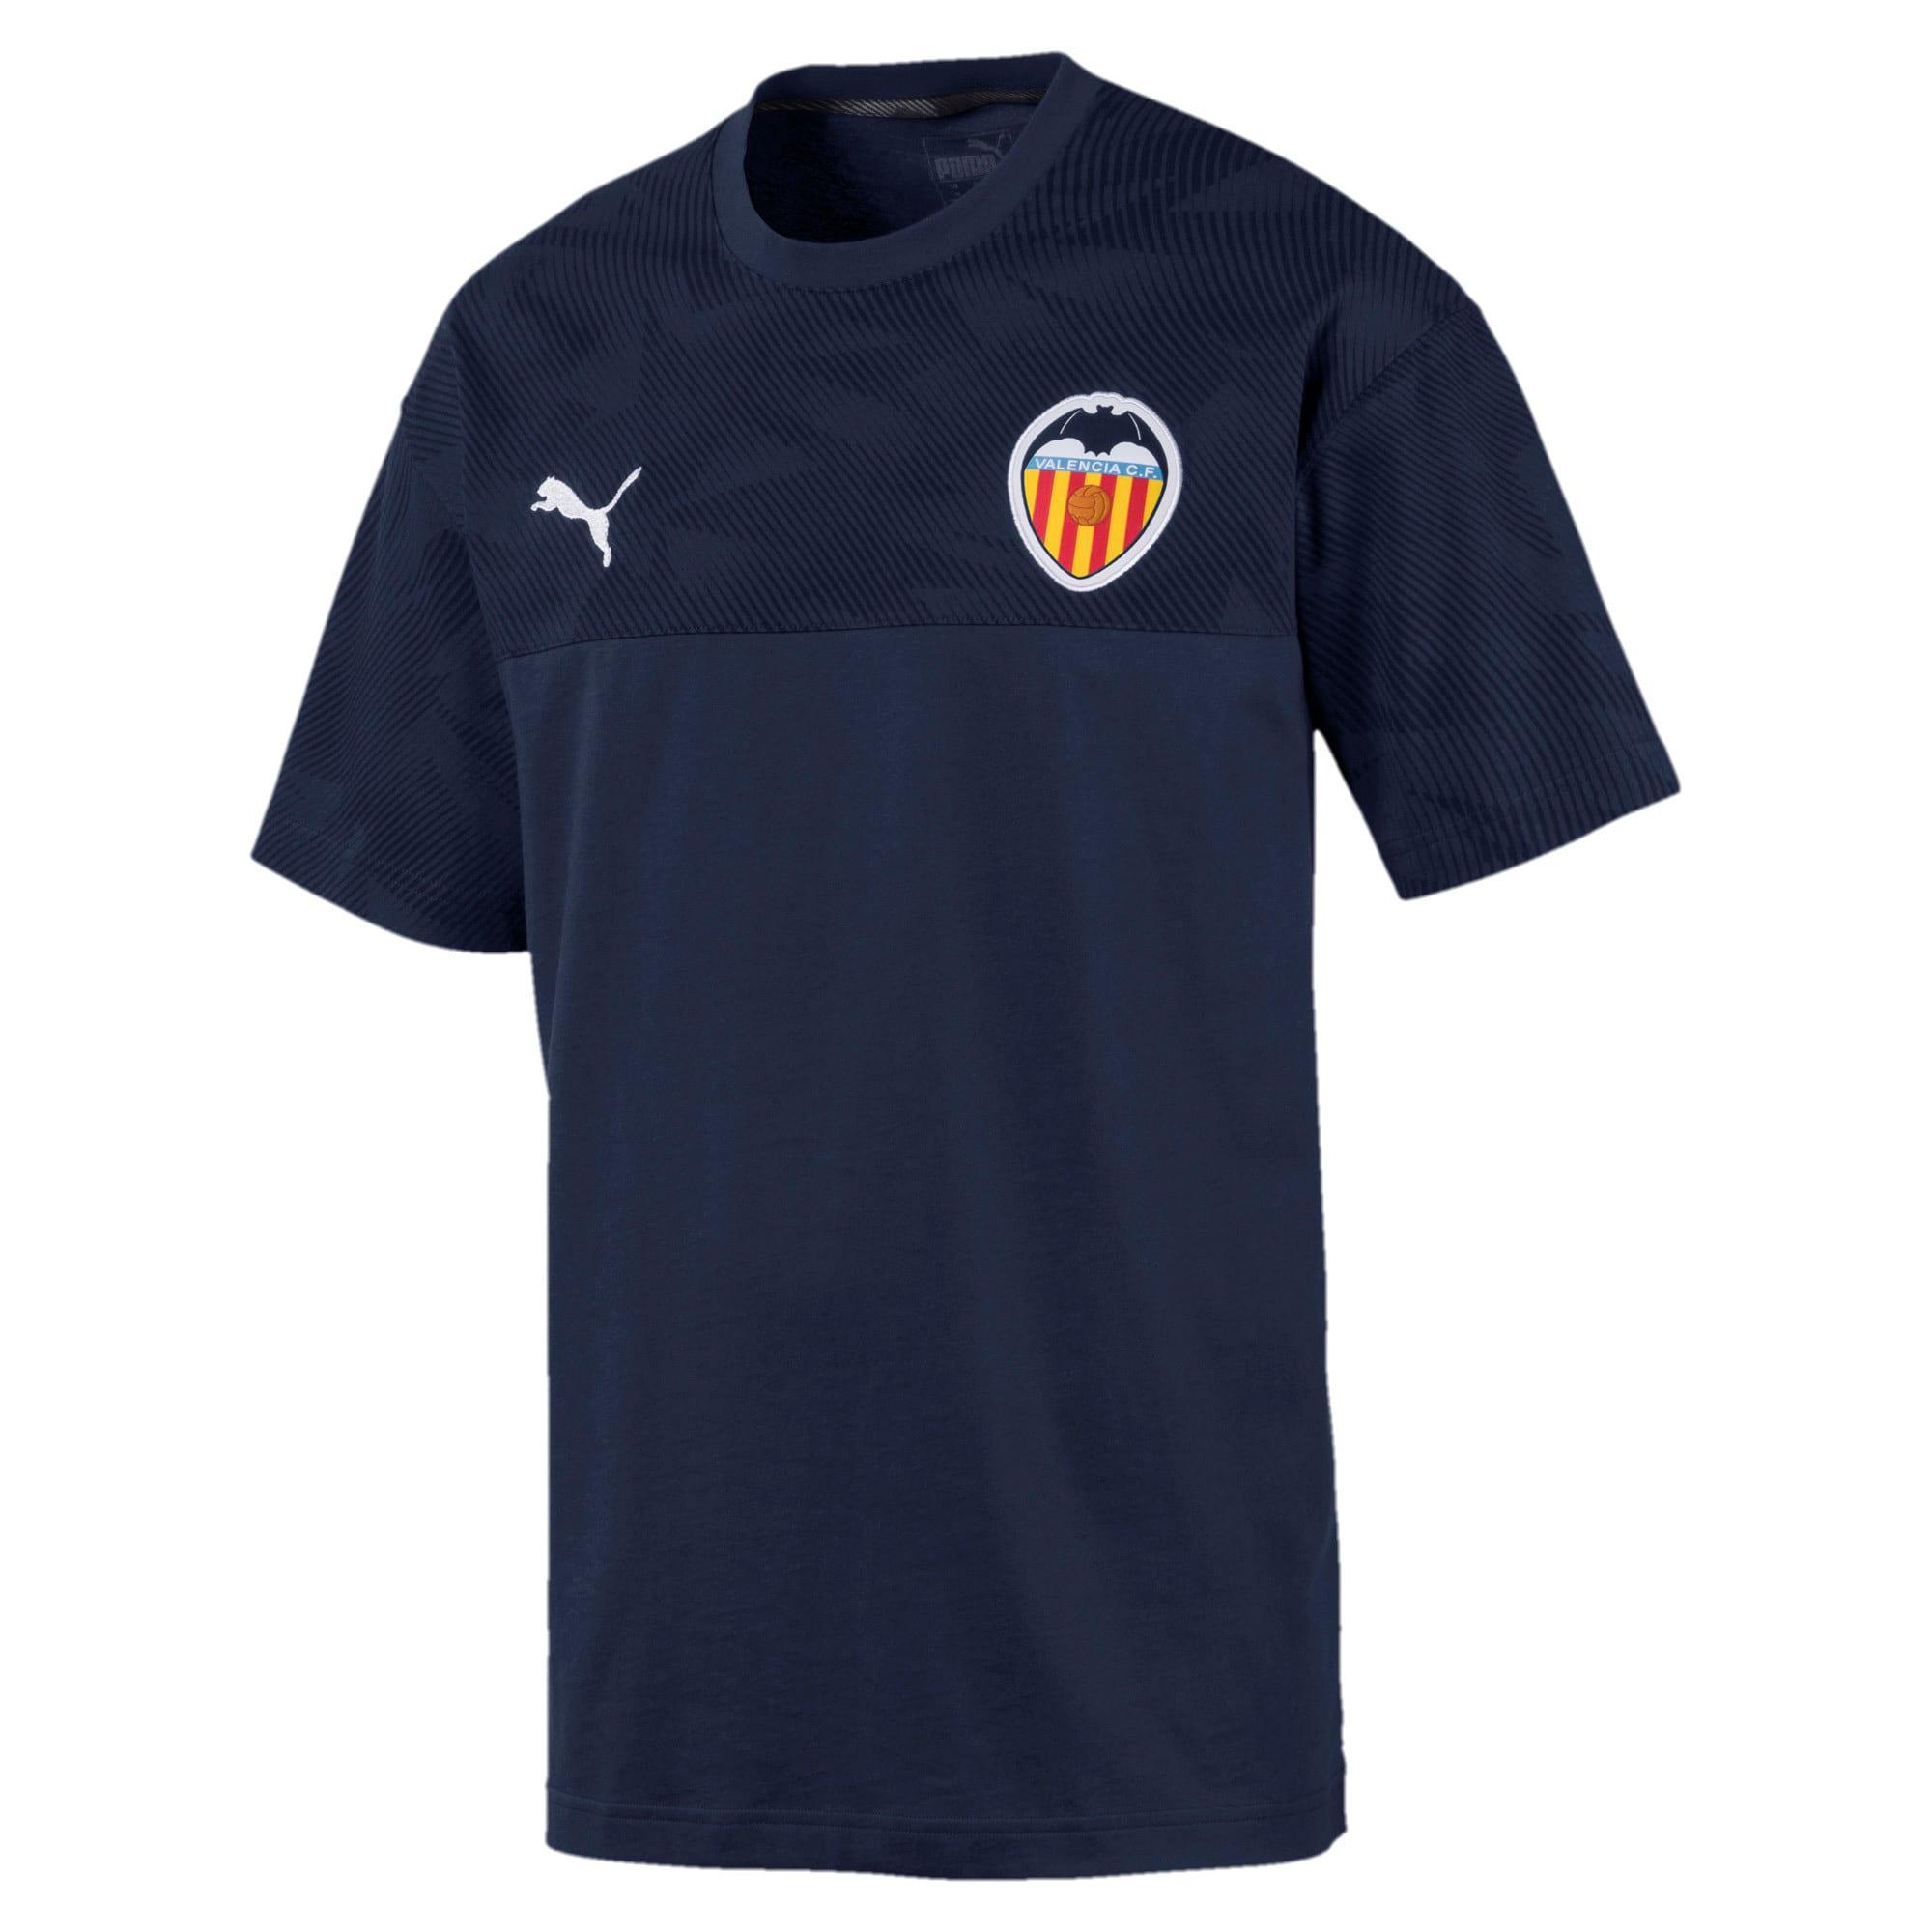 Thumbnail 1 of Valencia CF Casuals Men's Tee, Peacoat, medium